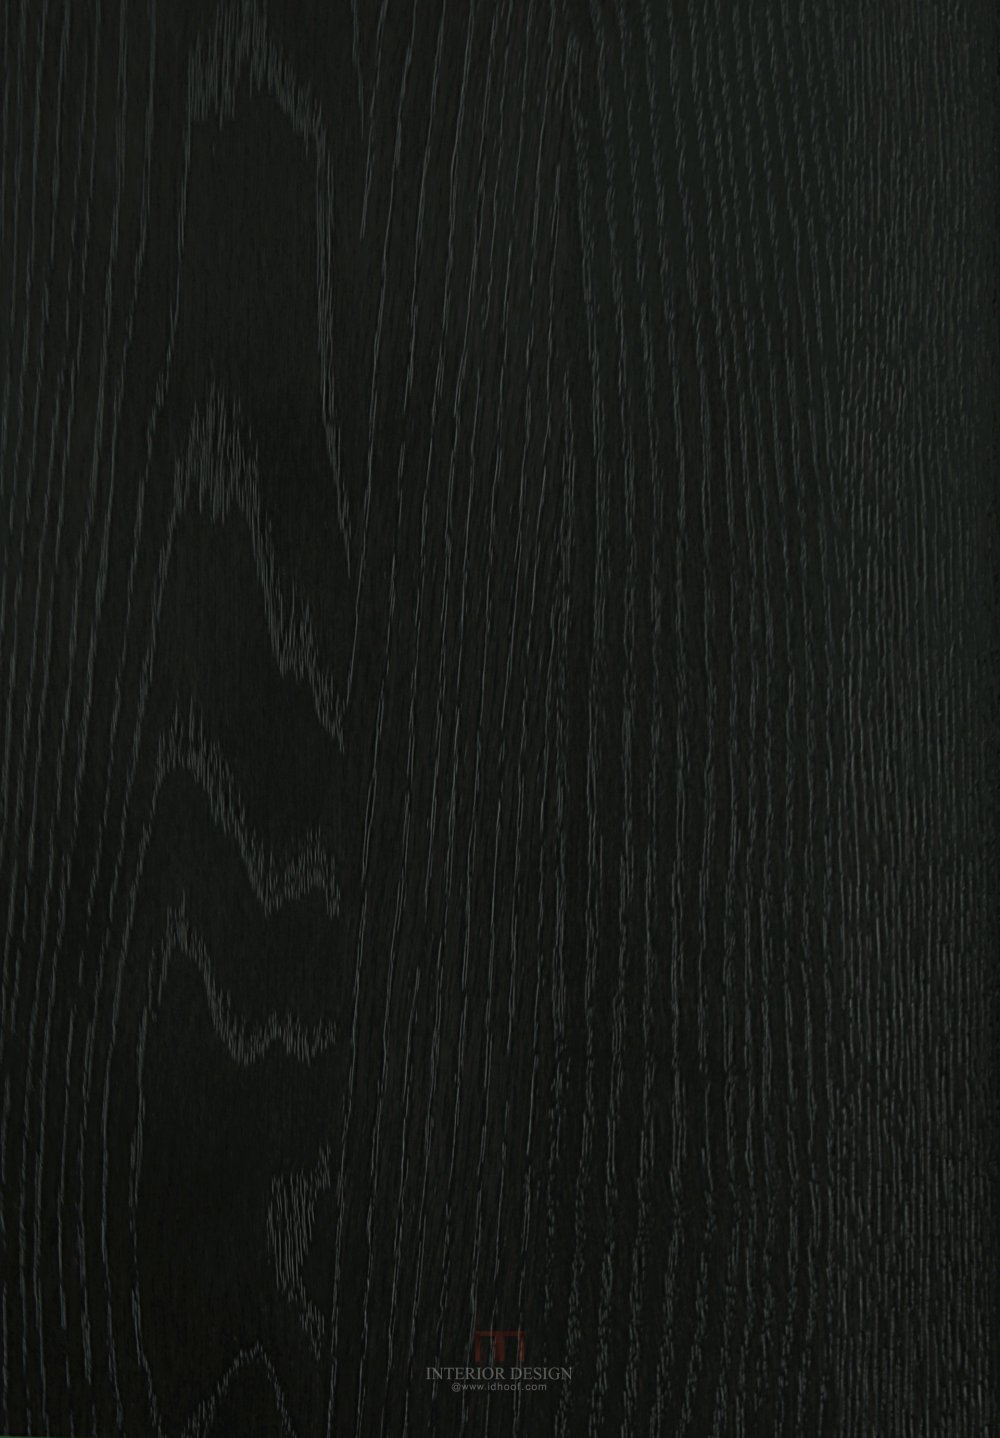 K6187BS_白橡木噴砂實木拼.jpg